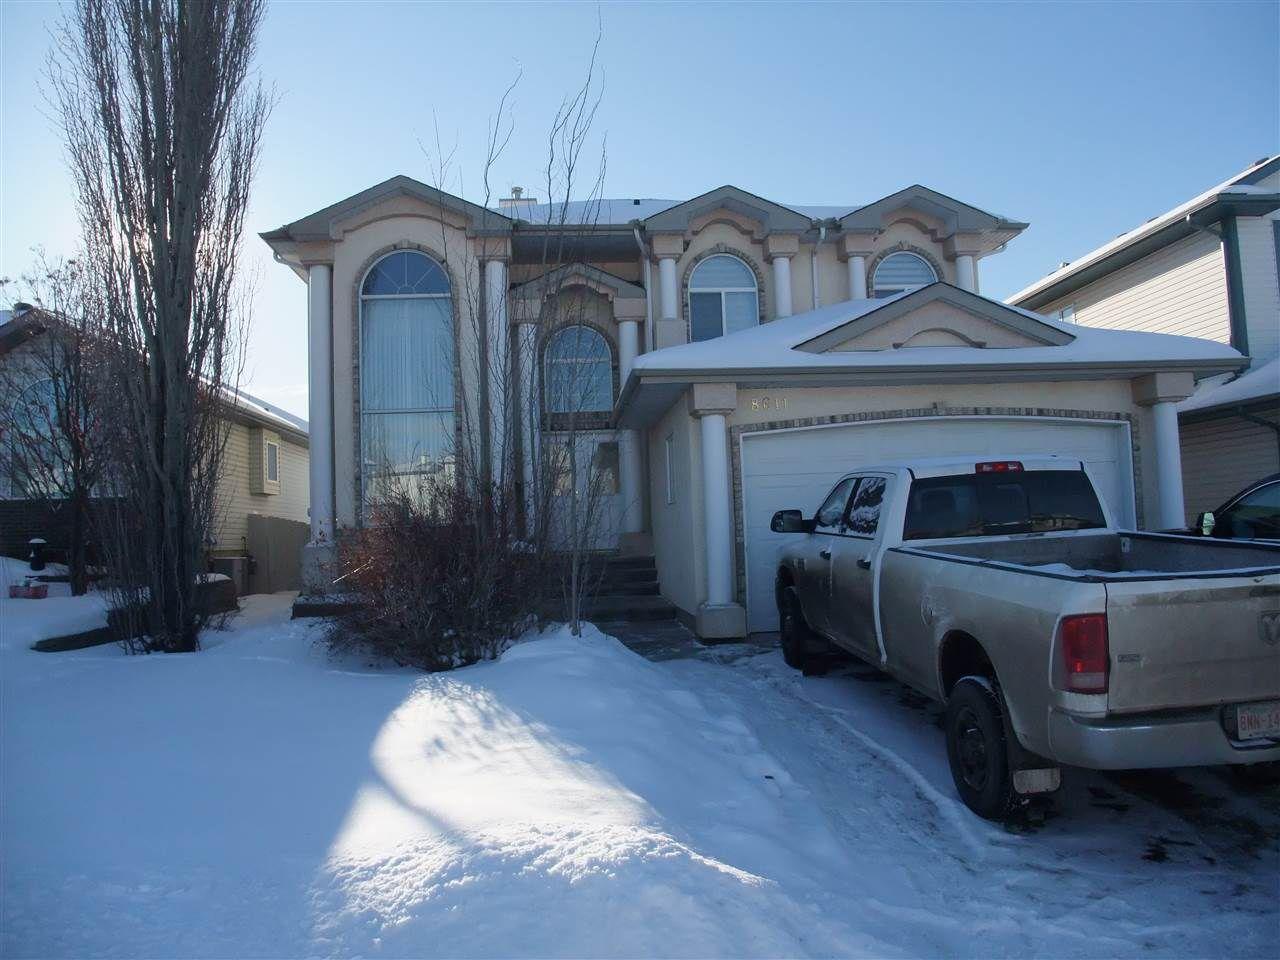 Main Photo: 8611 160A Avenue in Edmonton: Zone 28 House for sale : MLS®# E4141141